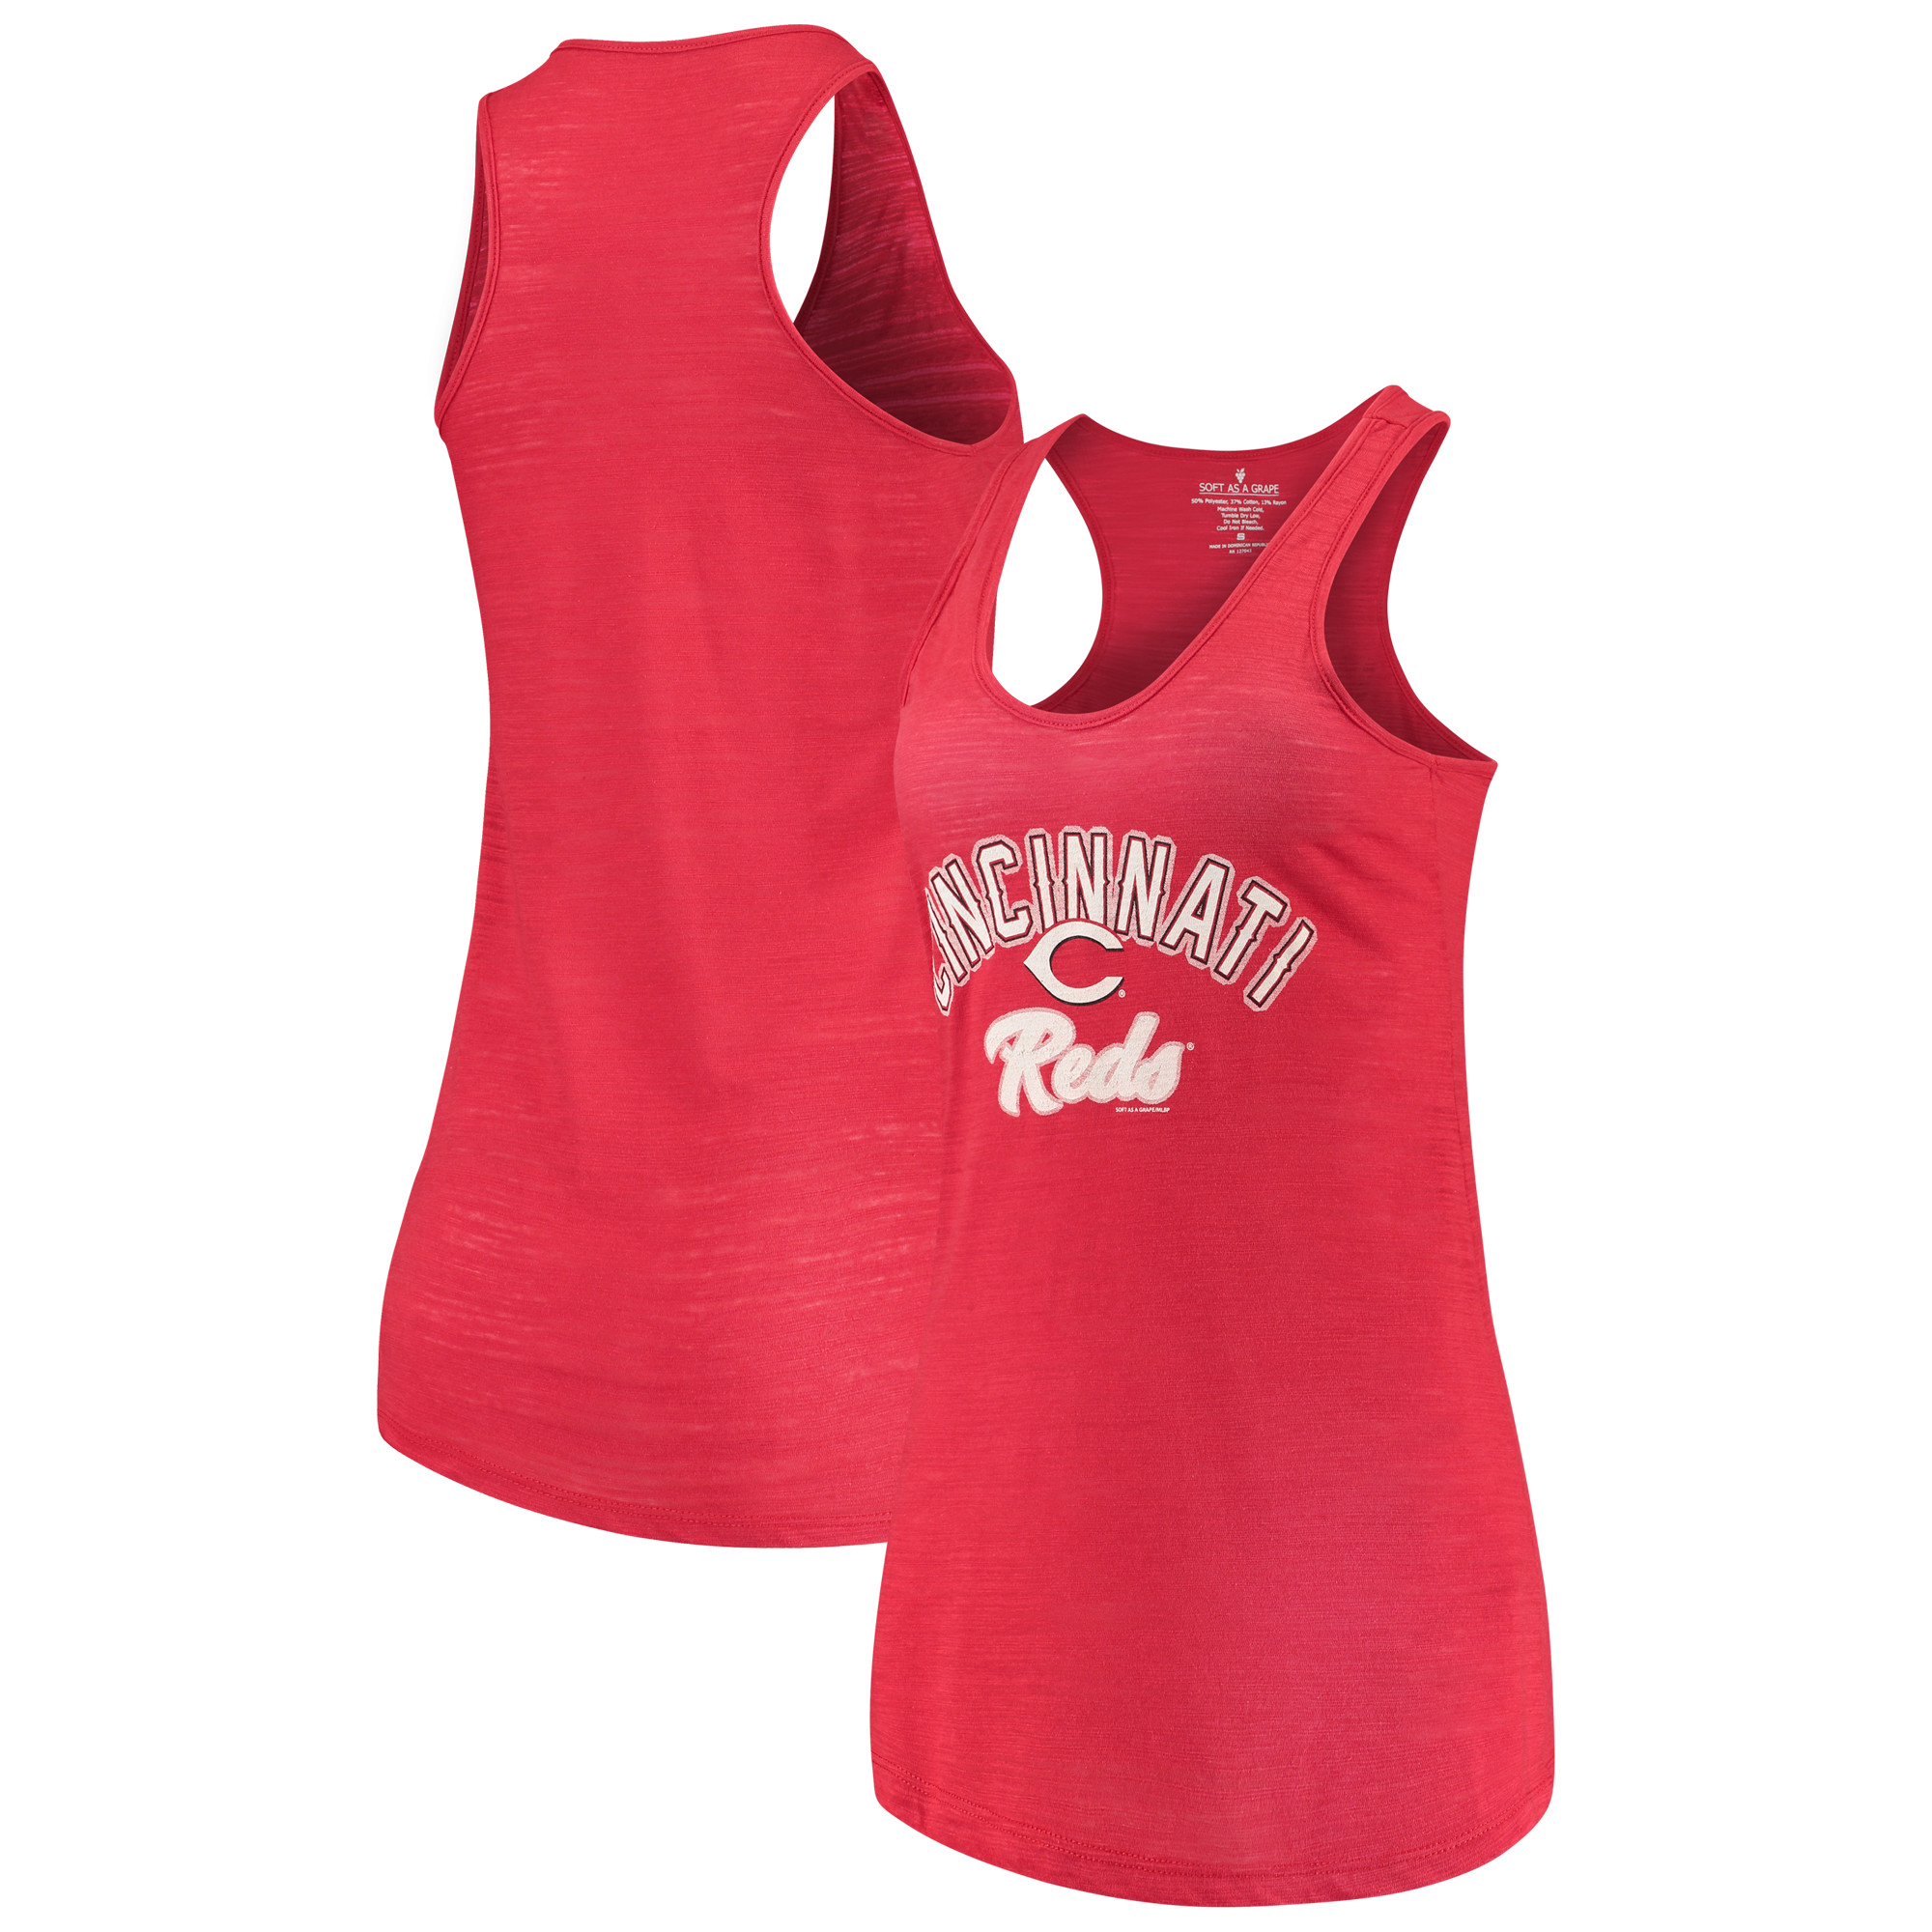 Cincinnati Reds Soft as a Grape Women's Multicount Racerback Tank Top - Red